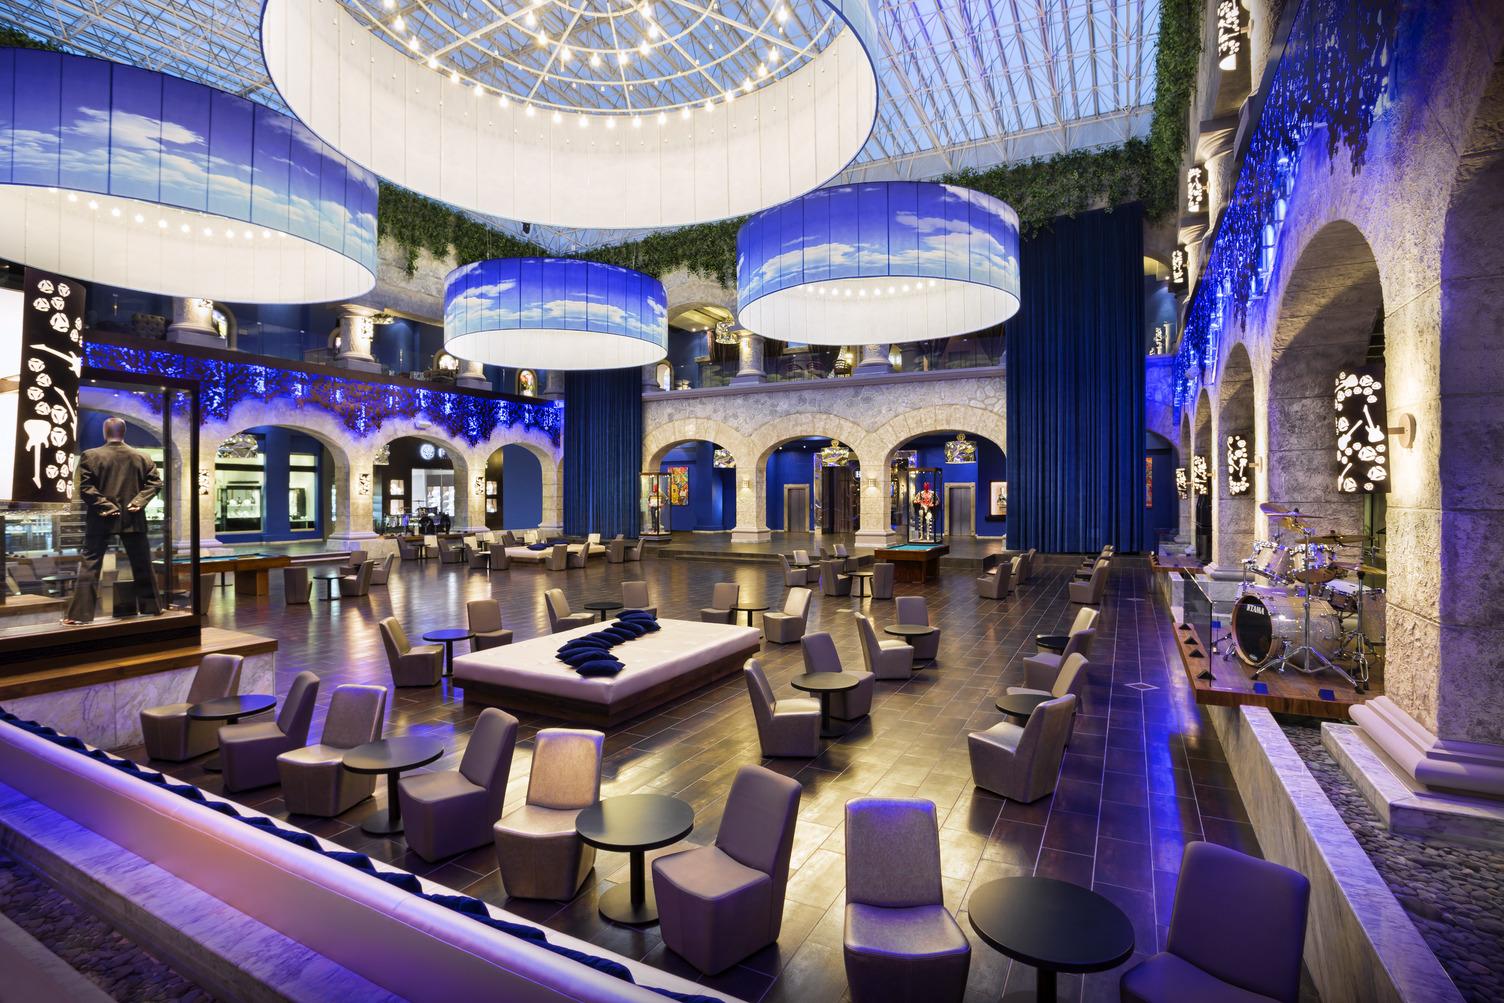 Travel Agency All-Inclusive Resort Heaven at Hard Rock Hotel Riviera Maya 23